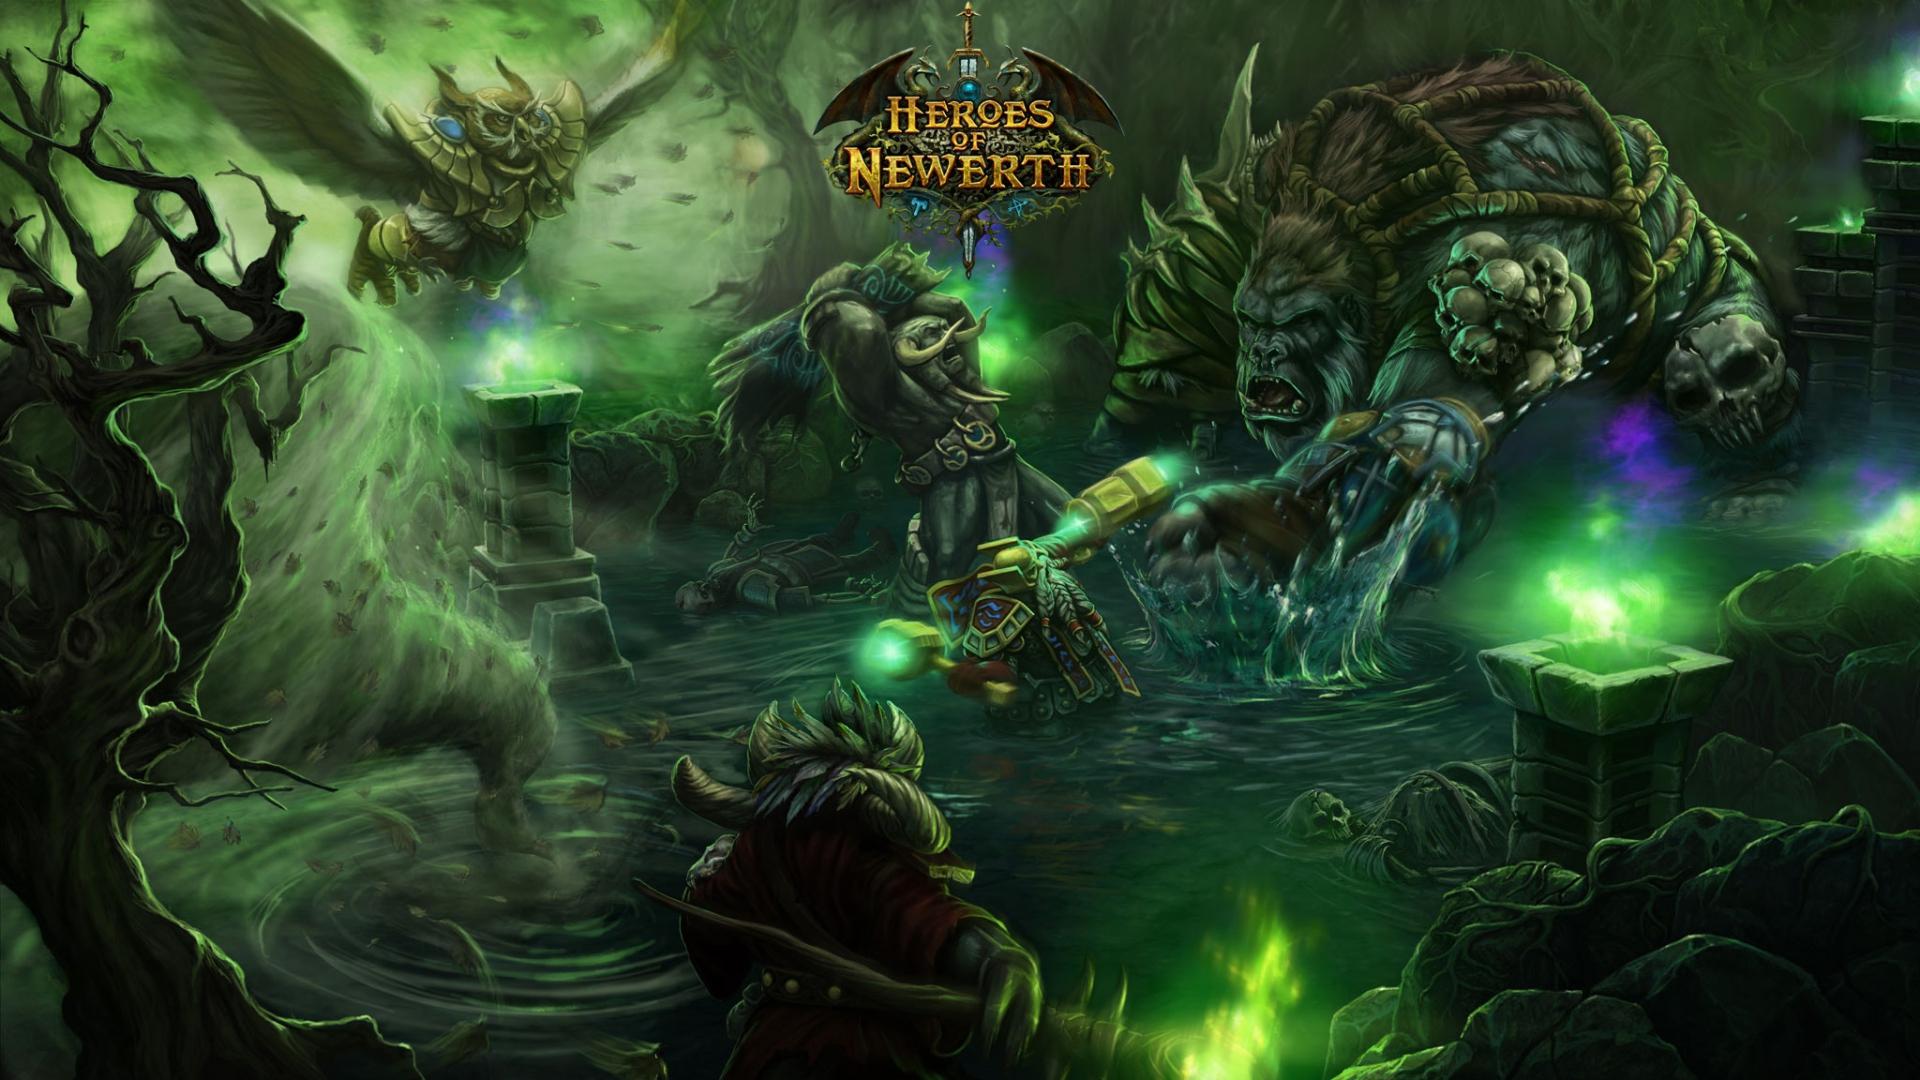 World Of Warcraft Battle For Azeroth Desktop Wallpaper Images Rh